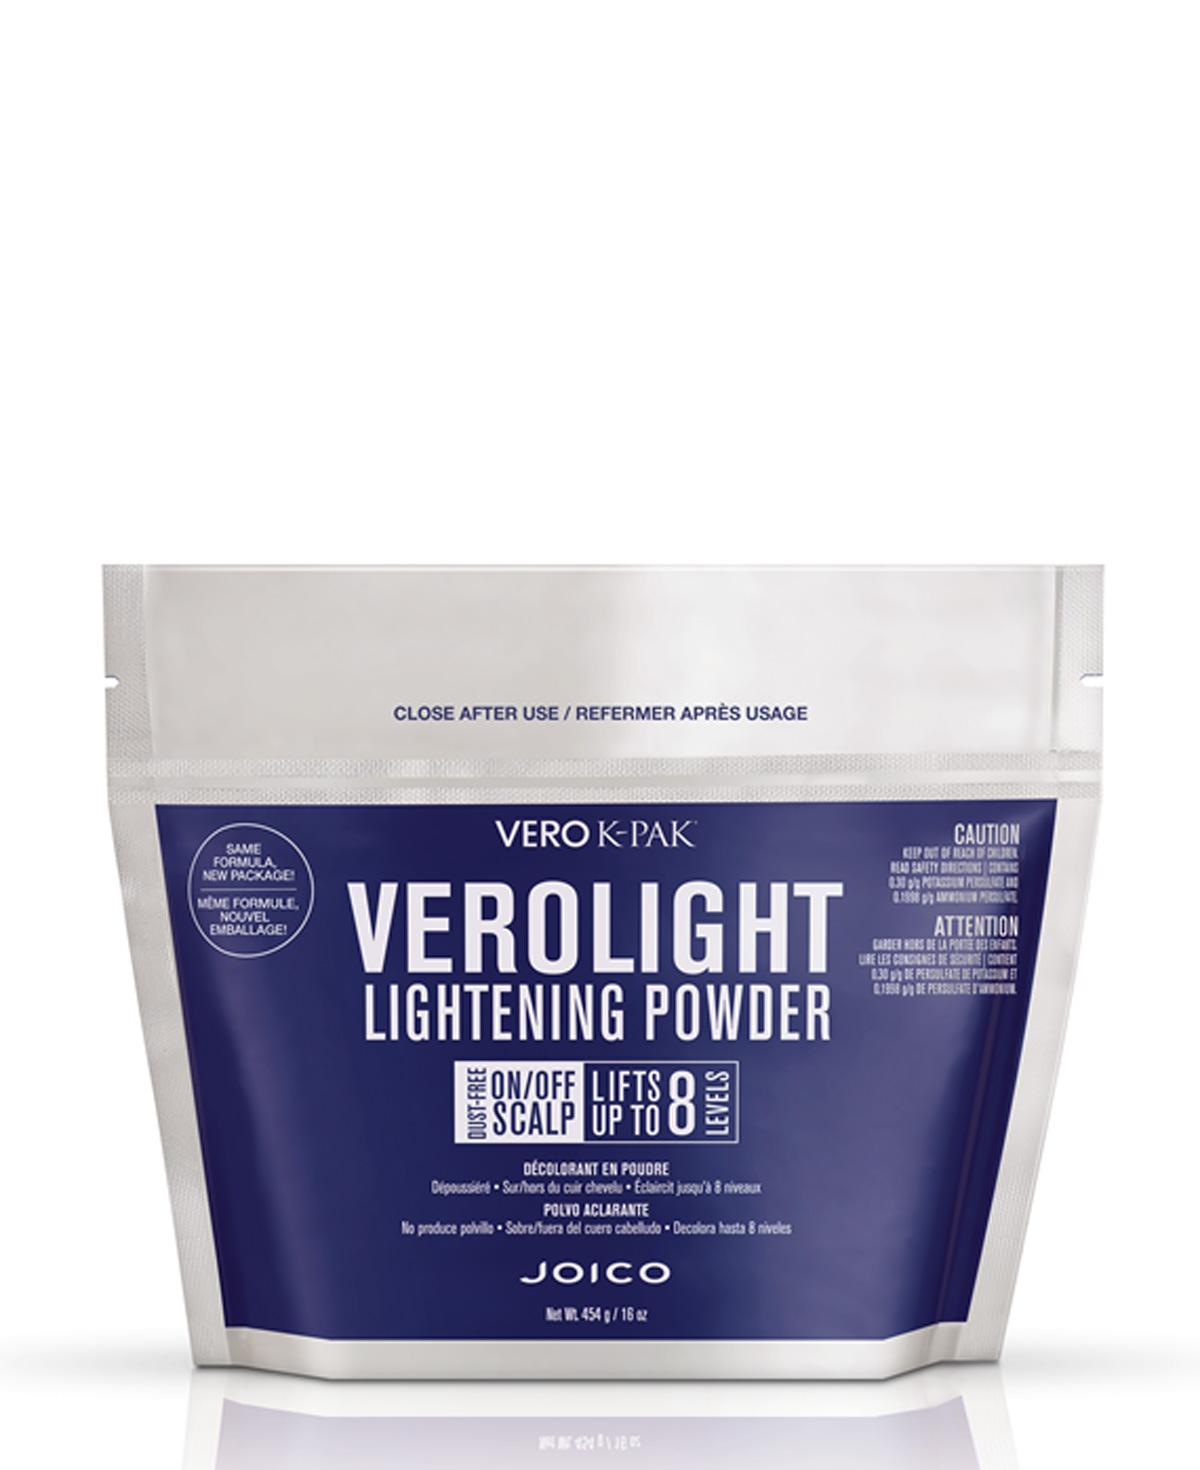 Joico VeroLight Lightening Powder Pouch 450g